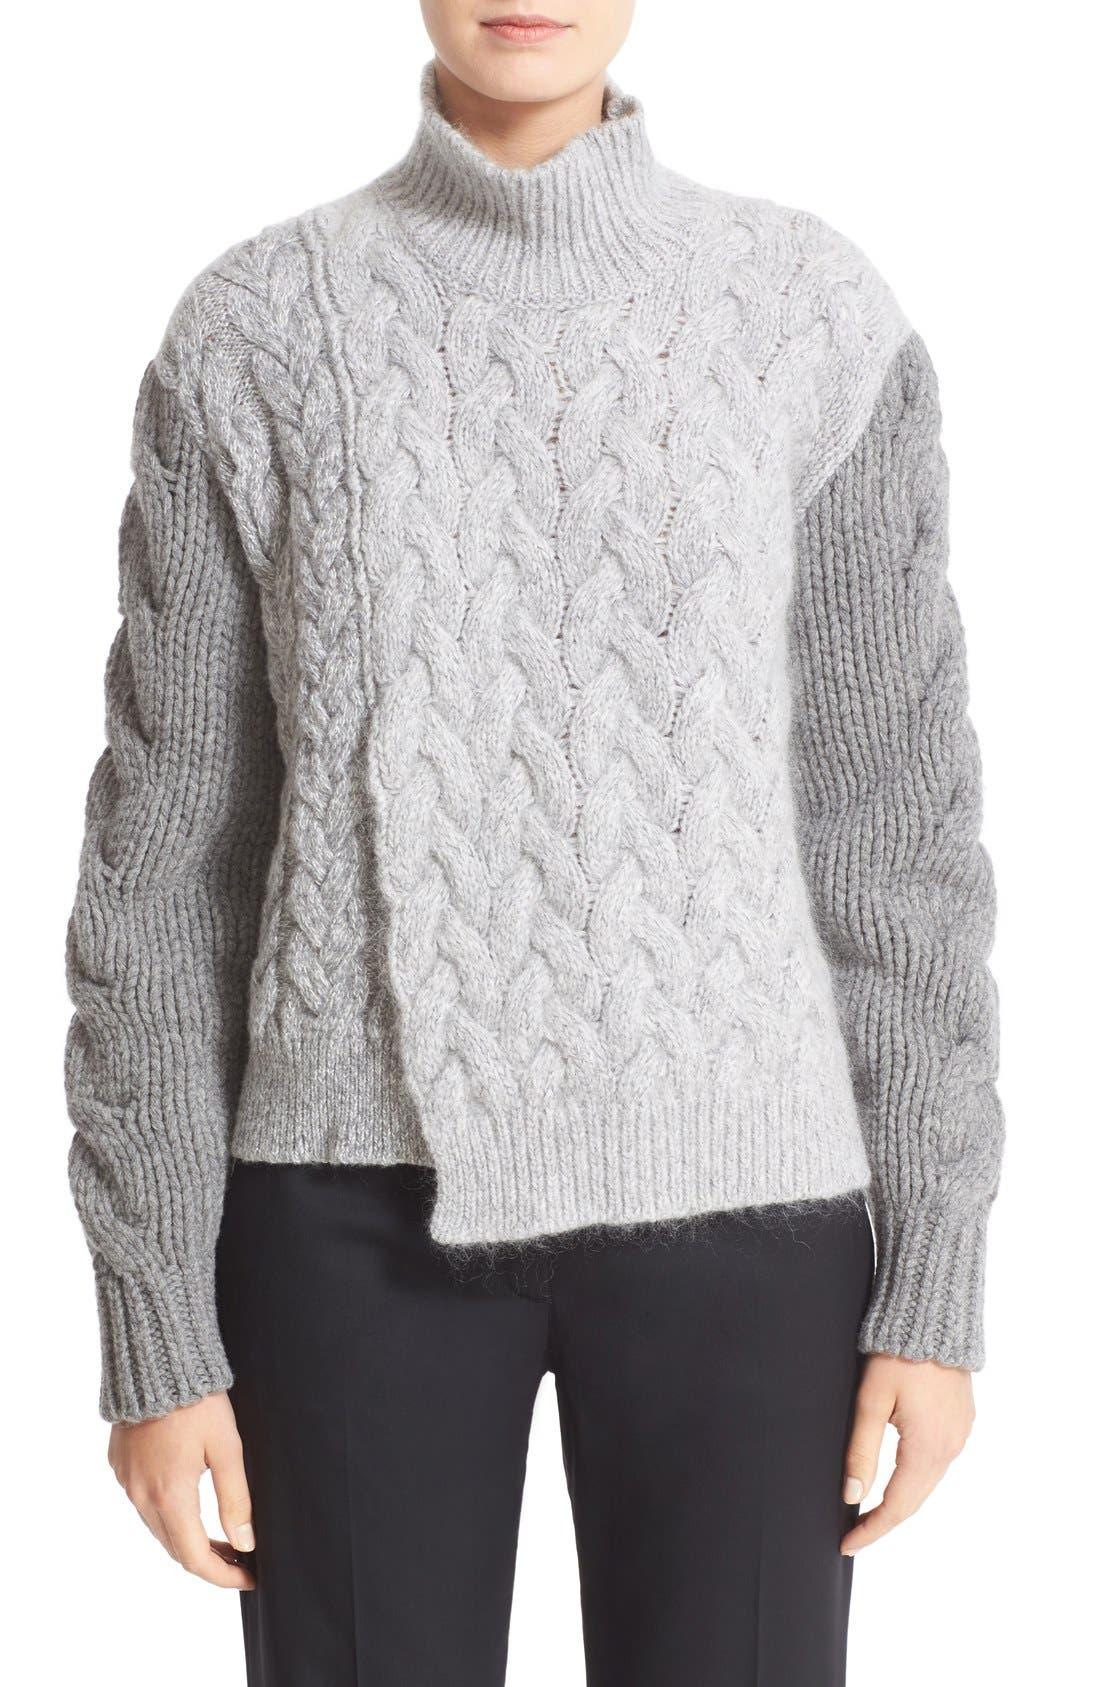 Main Image - Stella McCartney Mixed Media Turtleneck Sweater